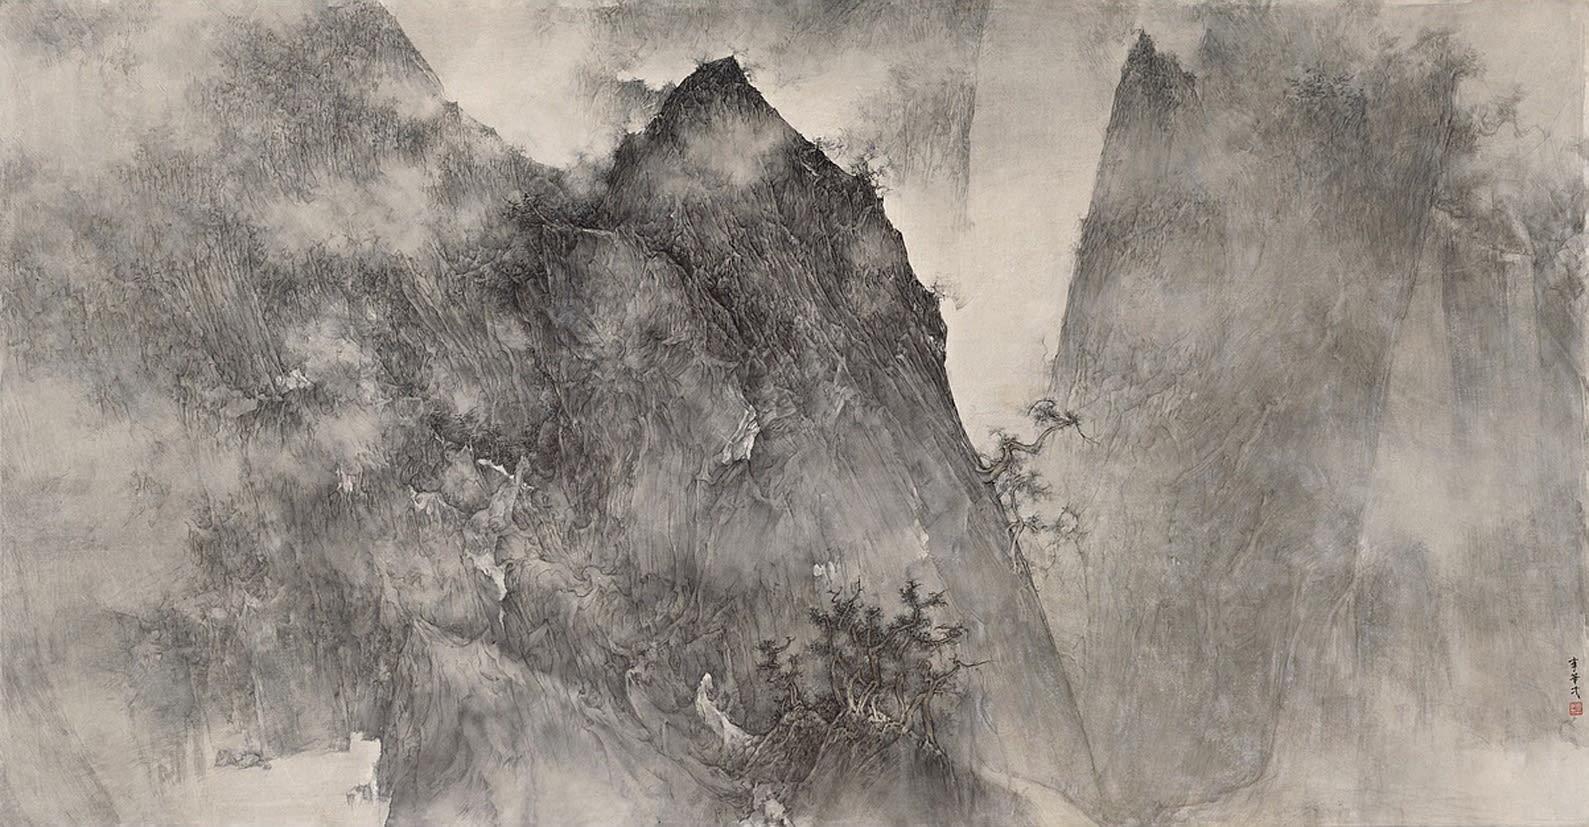 Li Huayi 李華弌, Mountain in Hermitage《幽山不染紅塵》, 2017